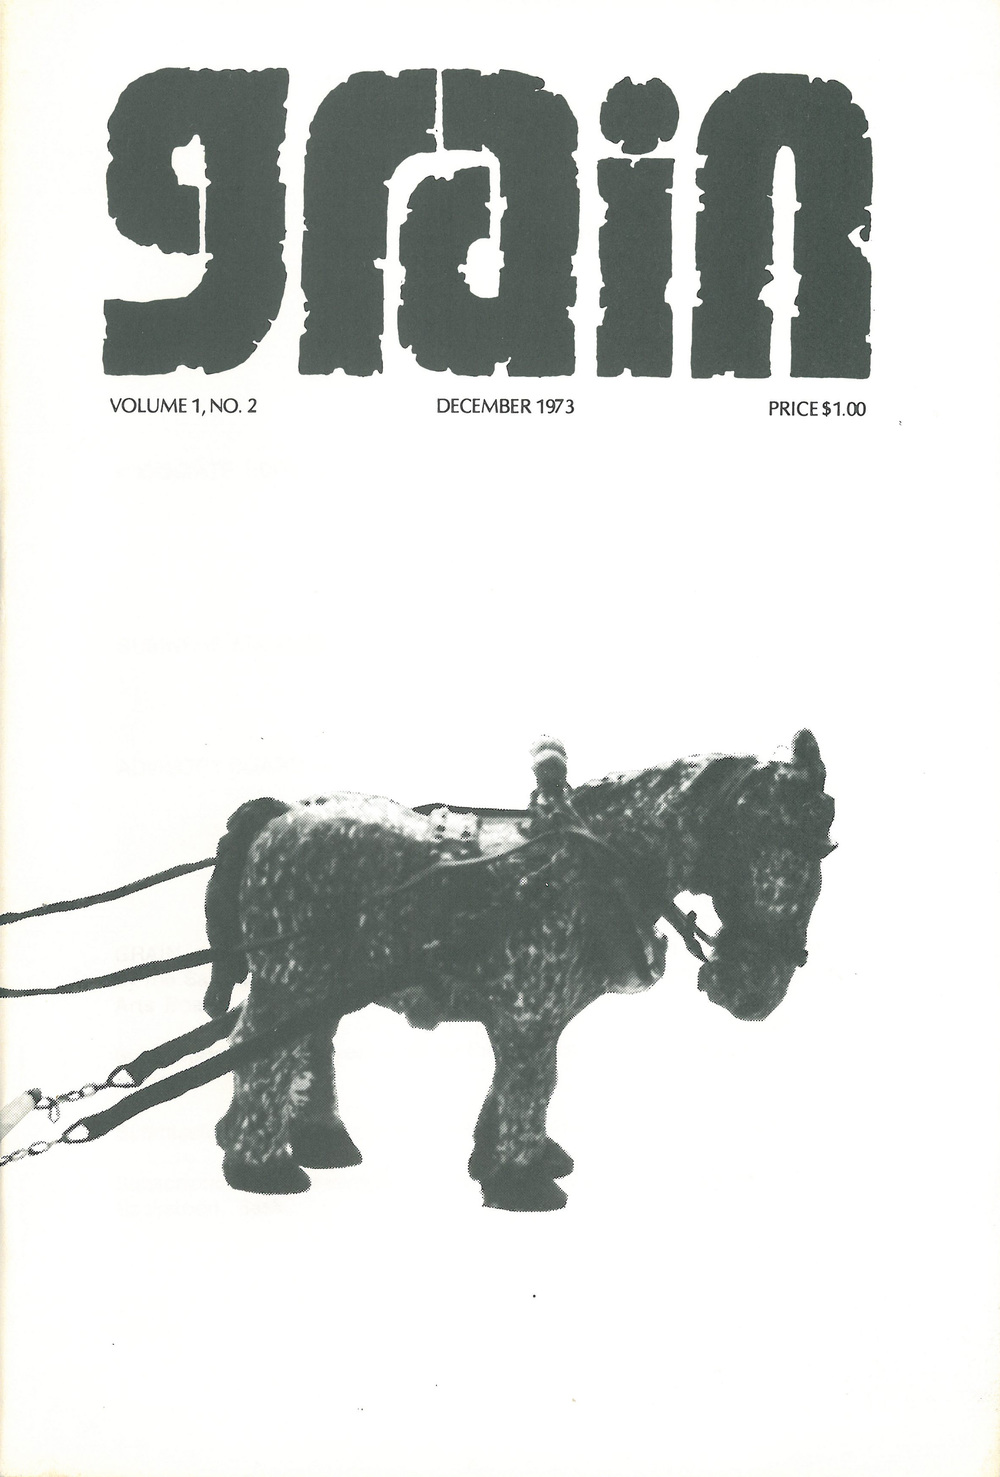 1.2 December 1973